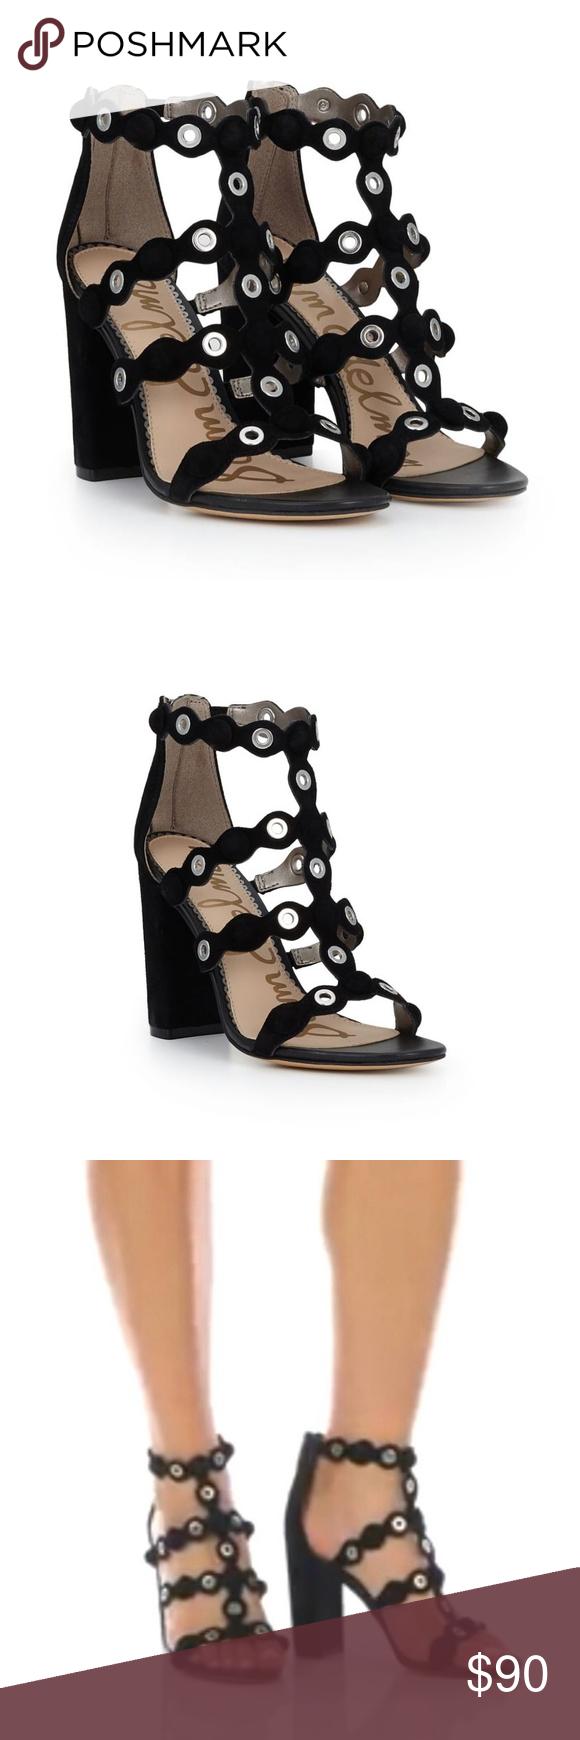 2bb7c37cff9f BNIB Sam Edelman Yuli Strappy Heeled Sandals Fun and fabulous